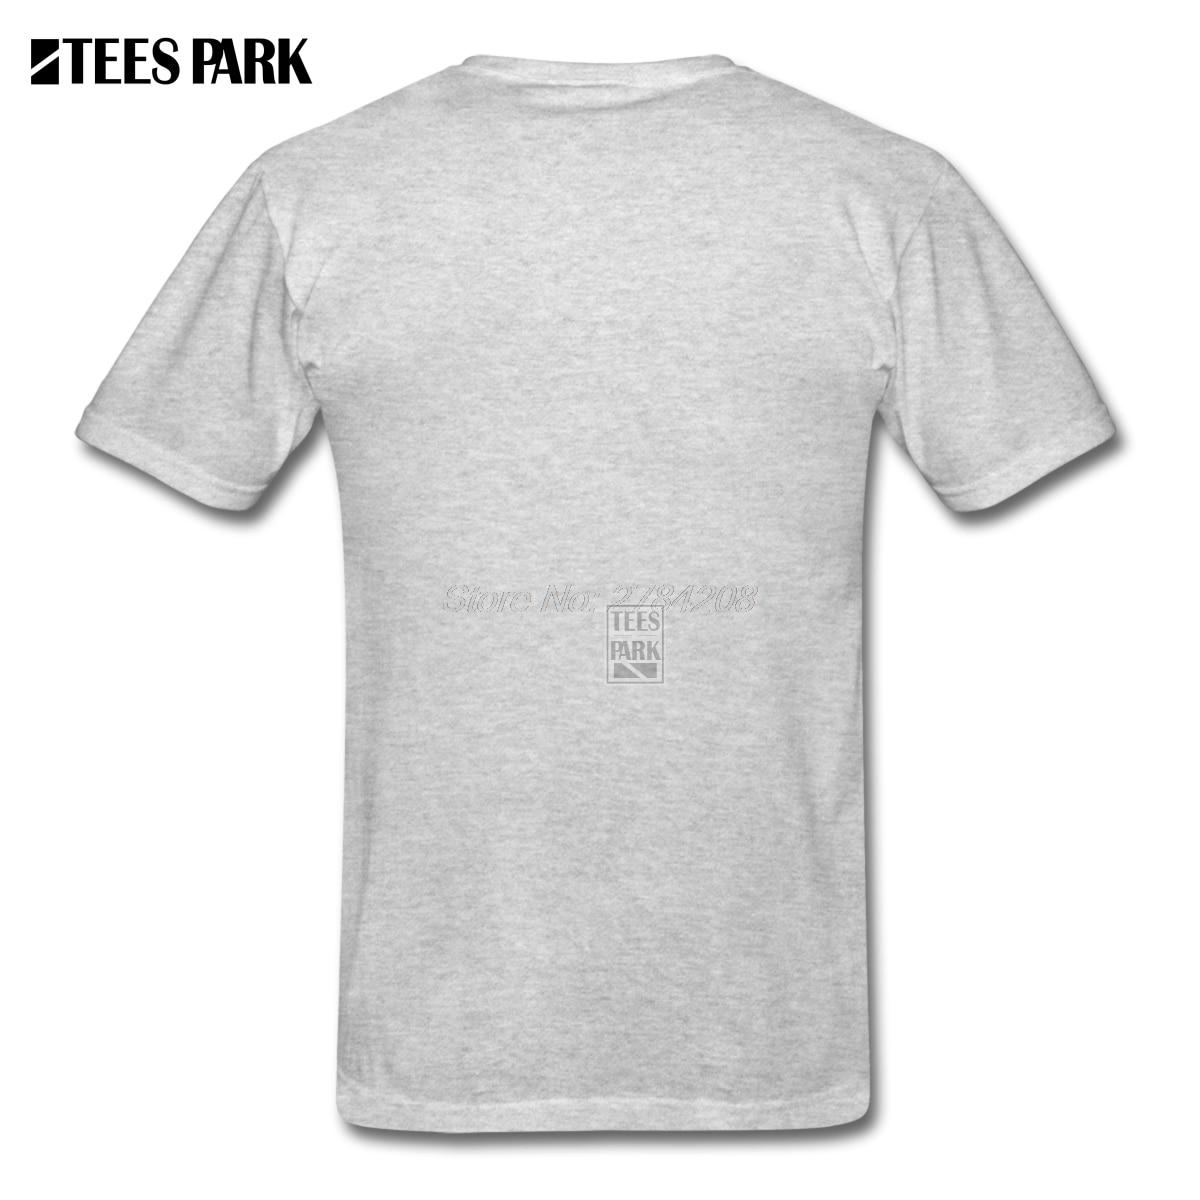 Clothes Plus Size Moonman Make It Mac Tonight Homme Pre-Cotton Short Sleeve Shirt Leisure Mens T Shirt Cool Design